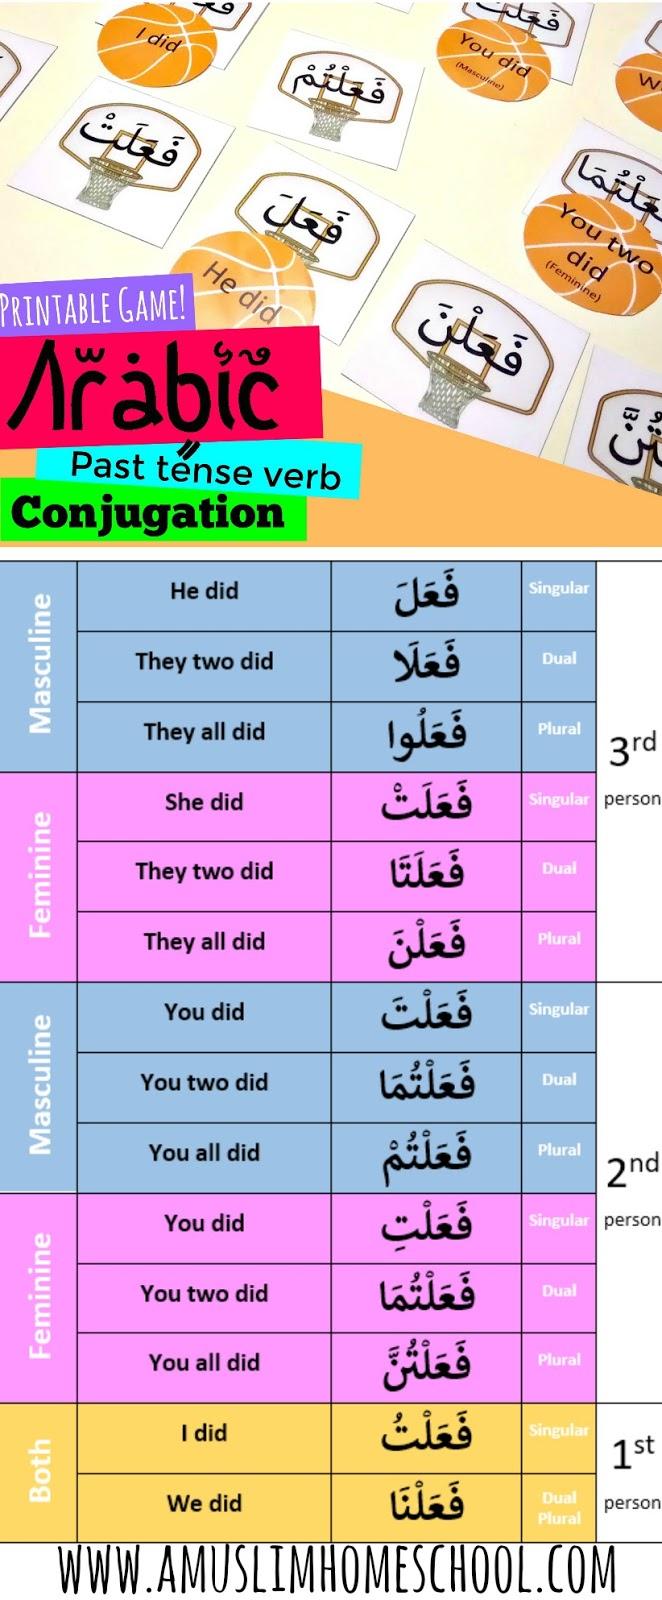 a muslim homeschool: Learning Arabic past tense verb